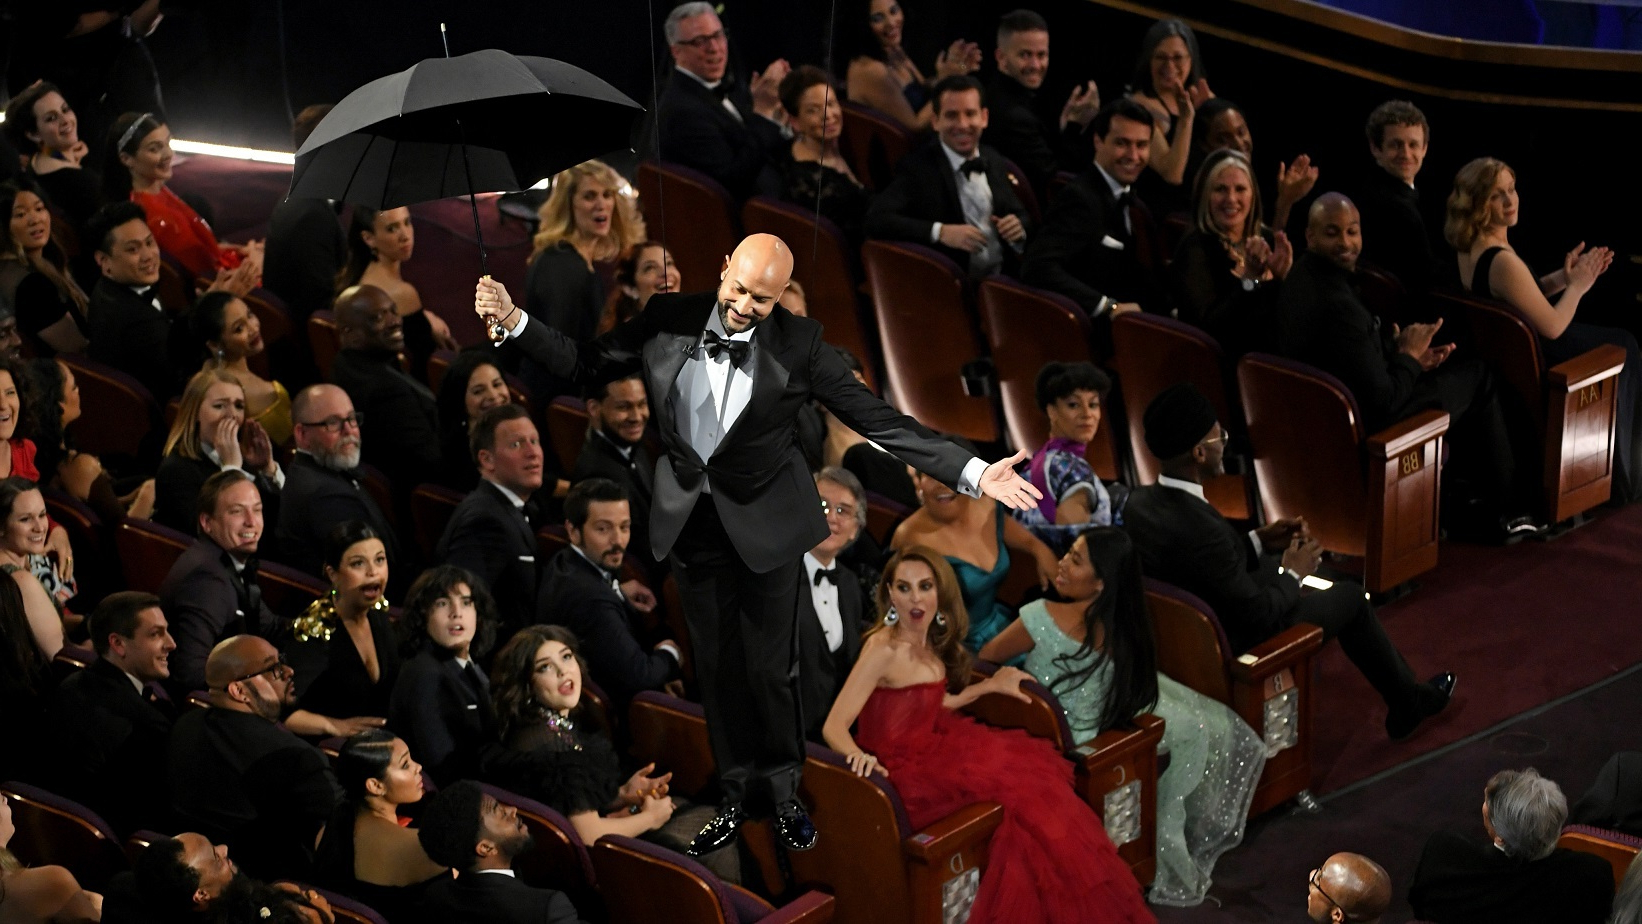 Keegan Market Umbrellas Regarding Well Liked Oscars 2019: Keegan Michael Key Takes A Dig At Trump During Academy (View 8 of 20)